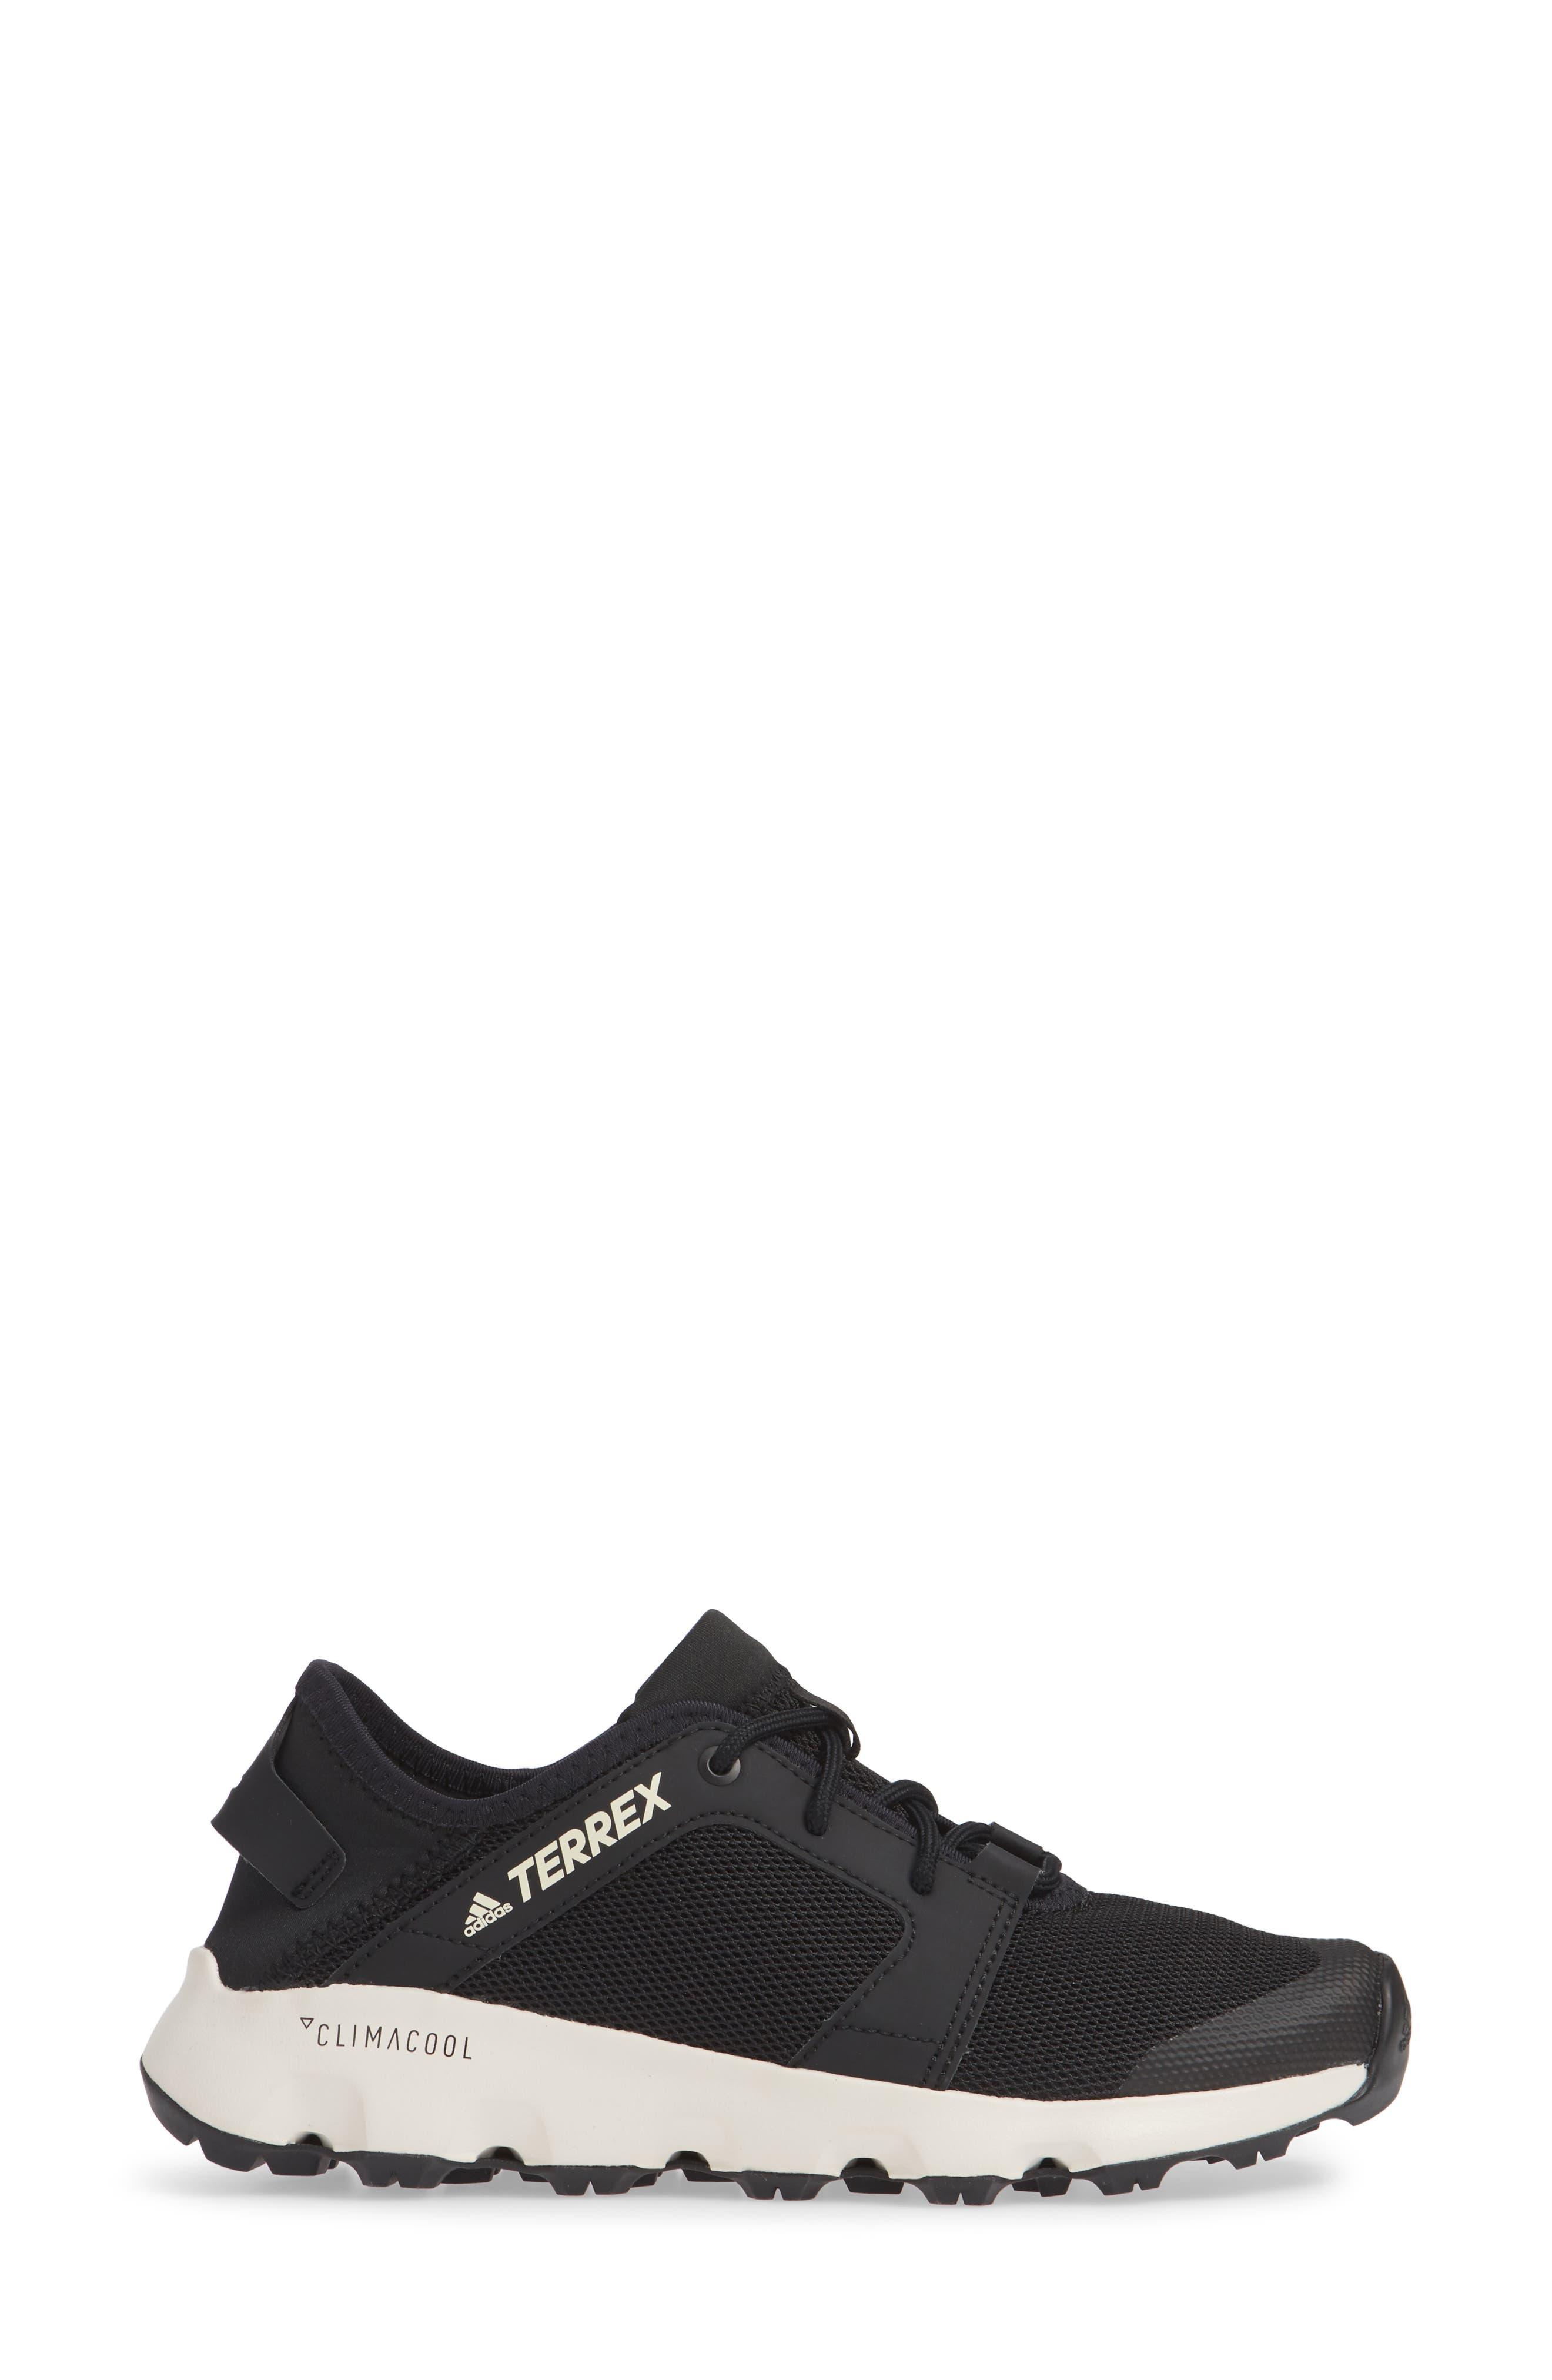 Terrex Climacool<sup>®</sup> Voyager Sleek Sneaker,                             Alternate thumbnail 3, color,                             BLACK/ BLACK/ CHALK WHITE